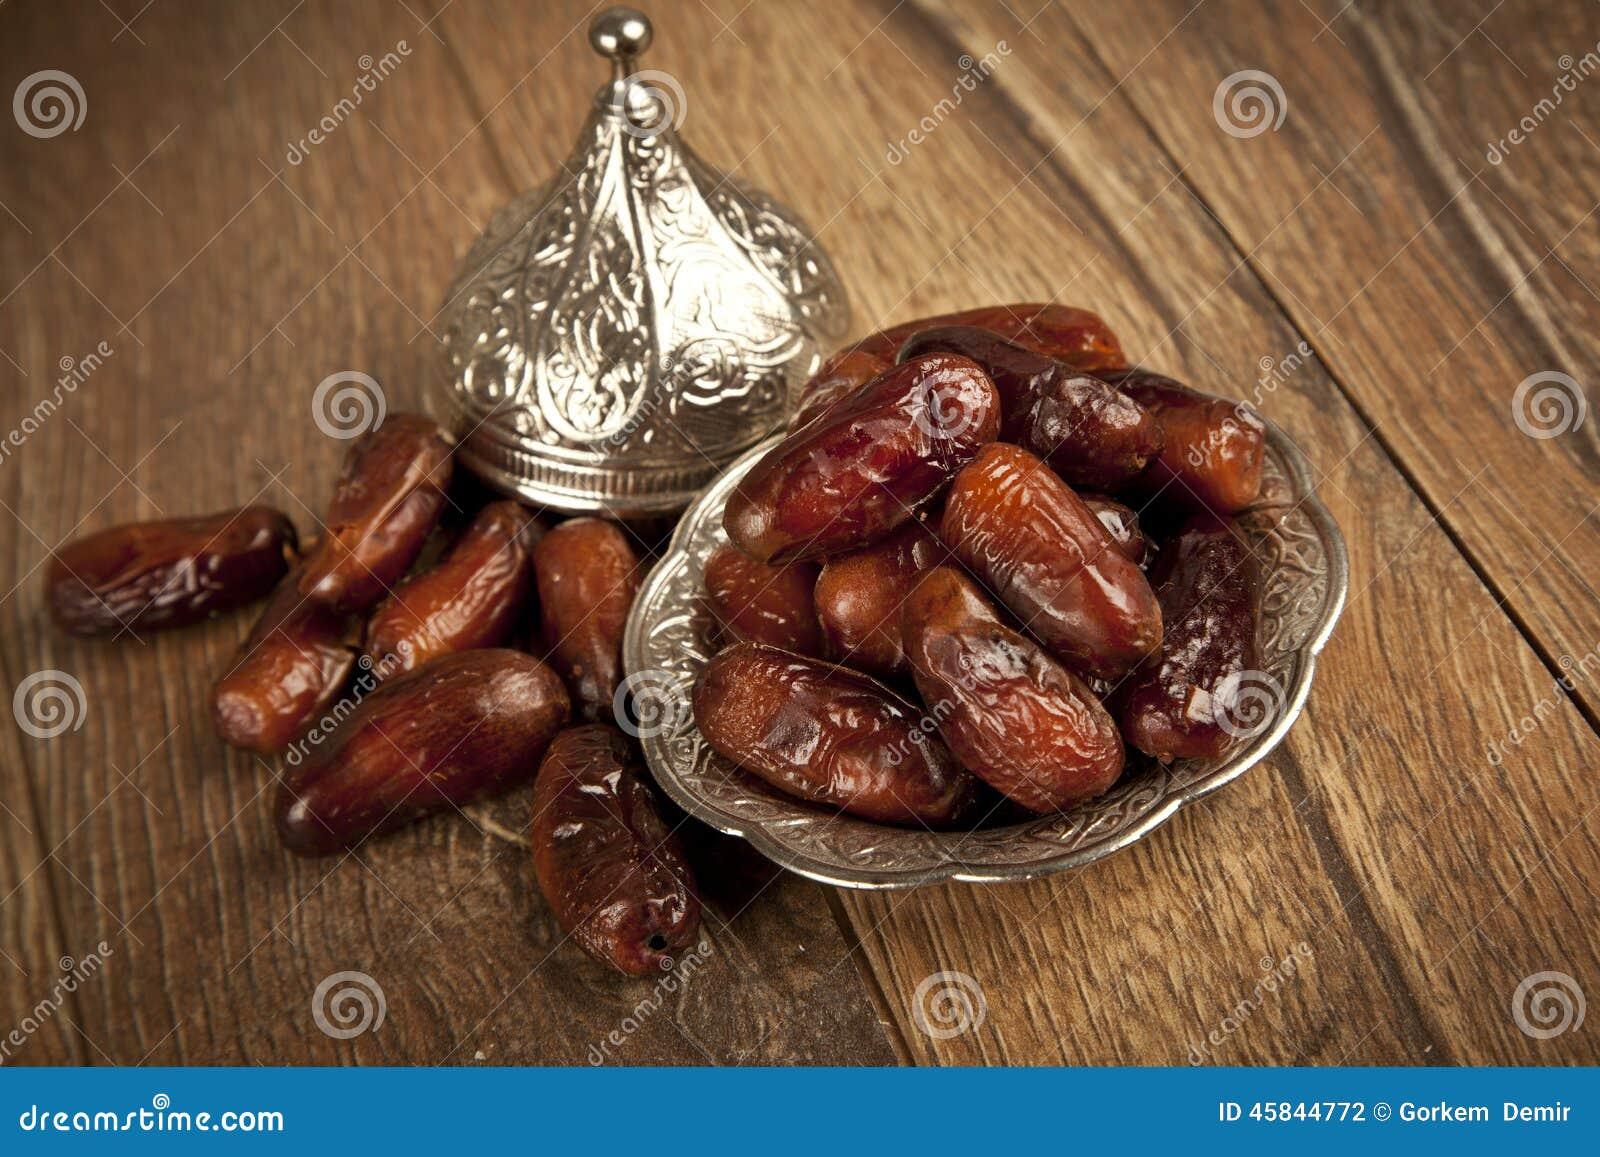 Dried date palm fruits or kurma, ramadan ( ramazan ) food